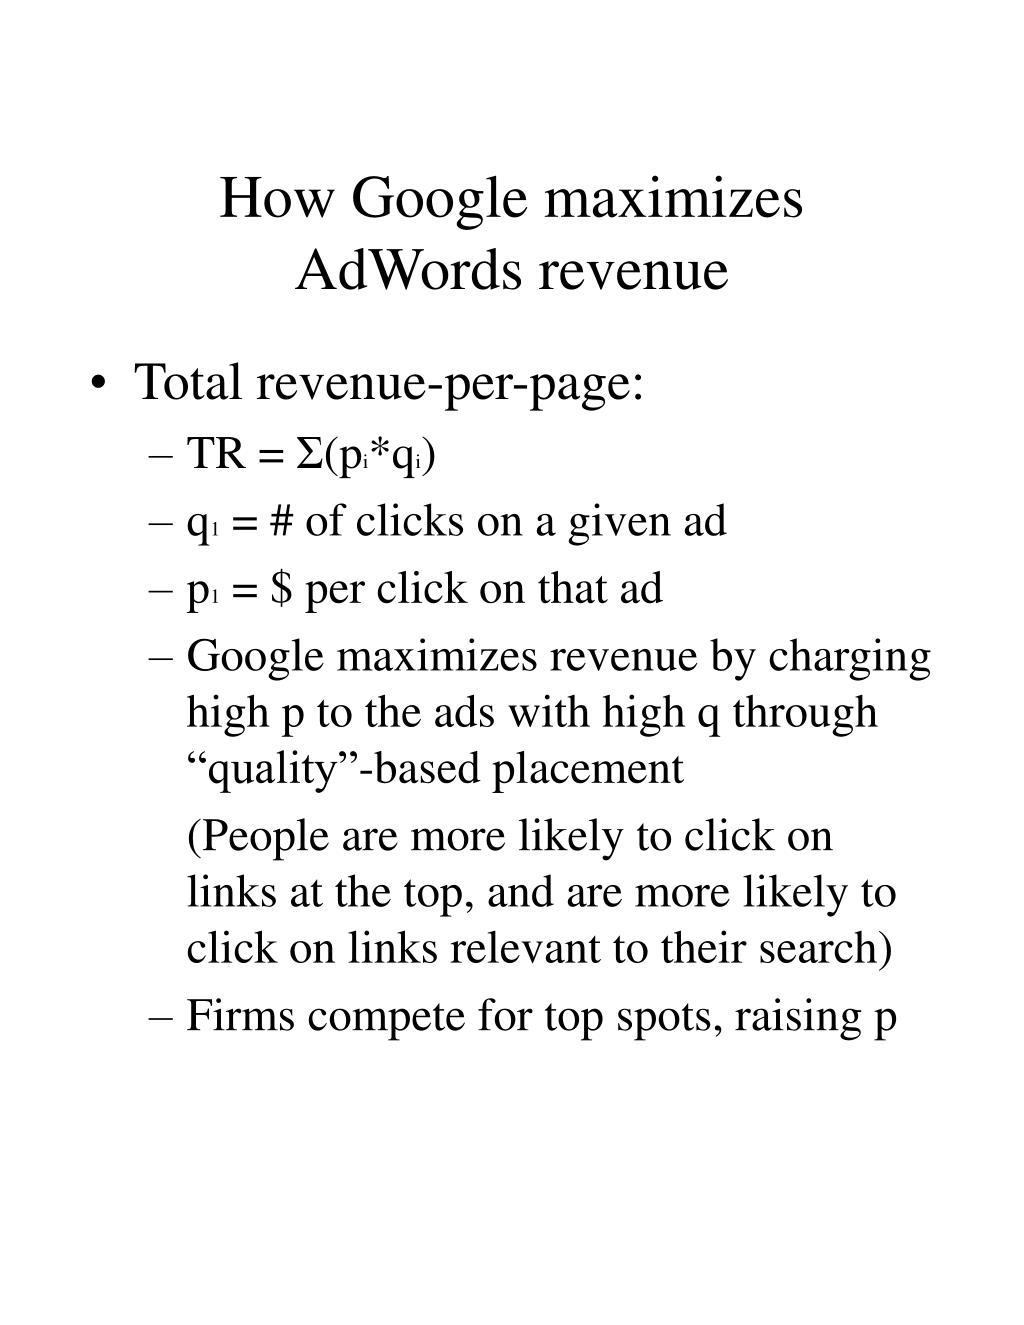 How Google maximizes AdWords revenue